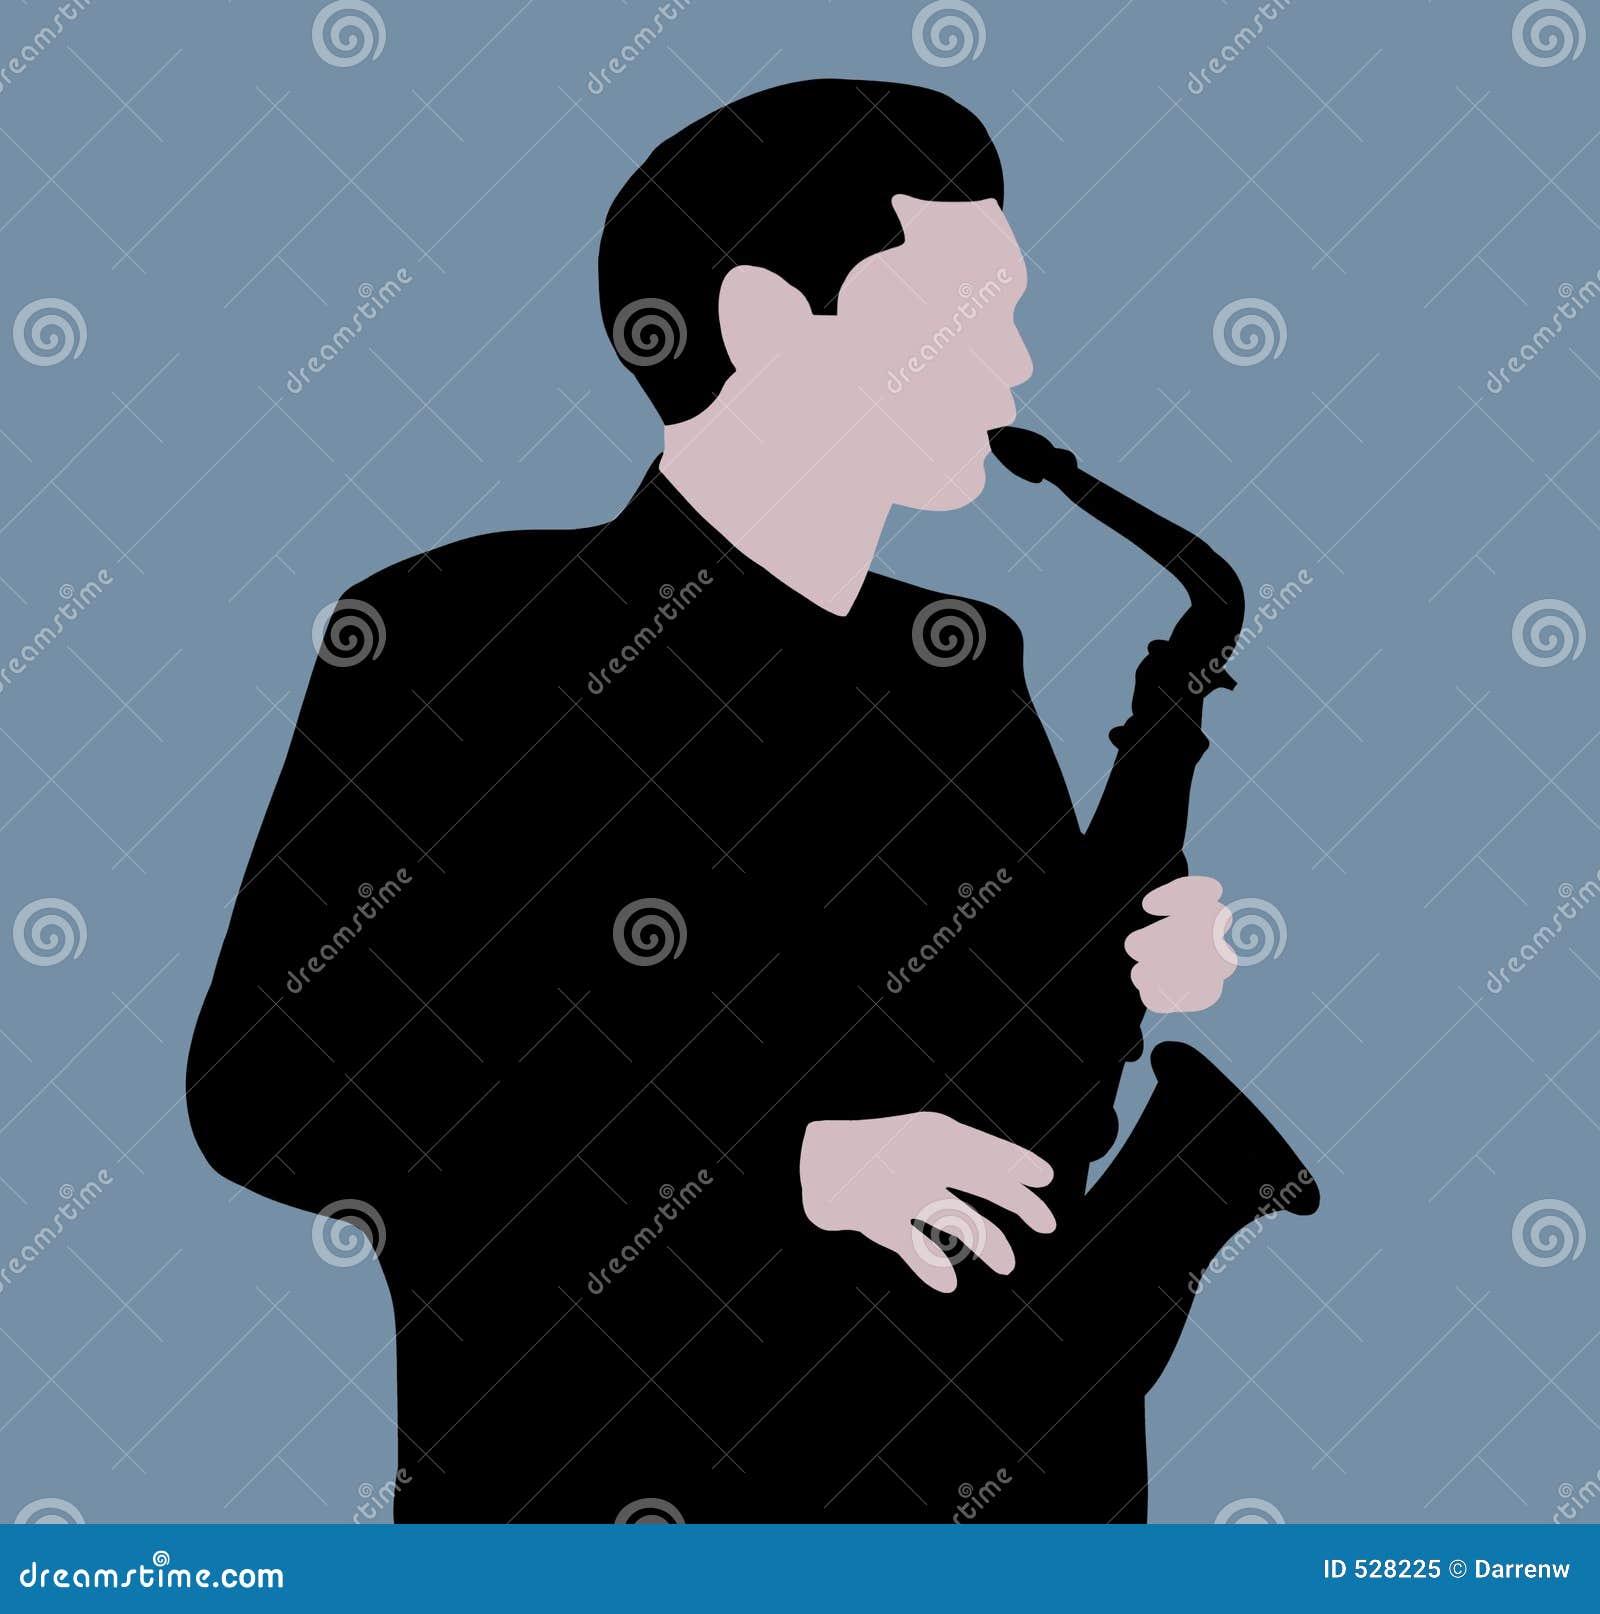 Download 球员萨克斯管 库存例证. 插画 包括有 可笑, 作用, 恐怖, 流行音乐, 葡萄酒, 乐队, 萨克斯管, 蓝色 - 528225